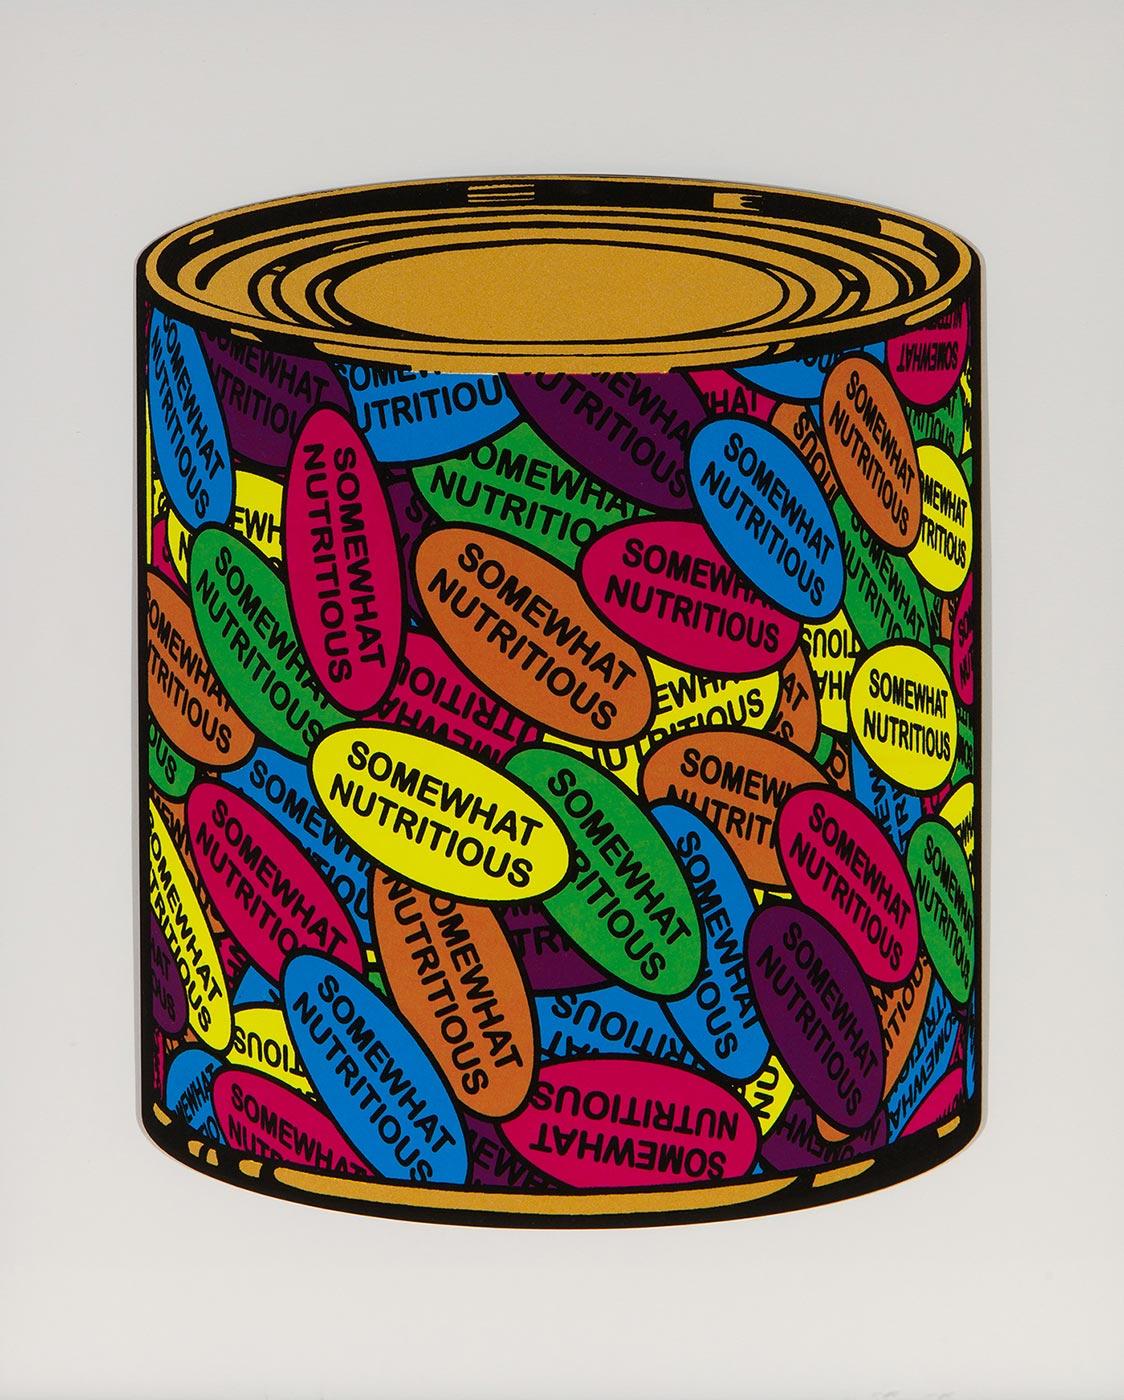 Jonathan Stewart - SOMEWHAT NUTRITIOUS